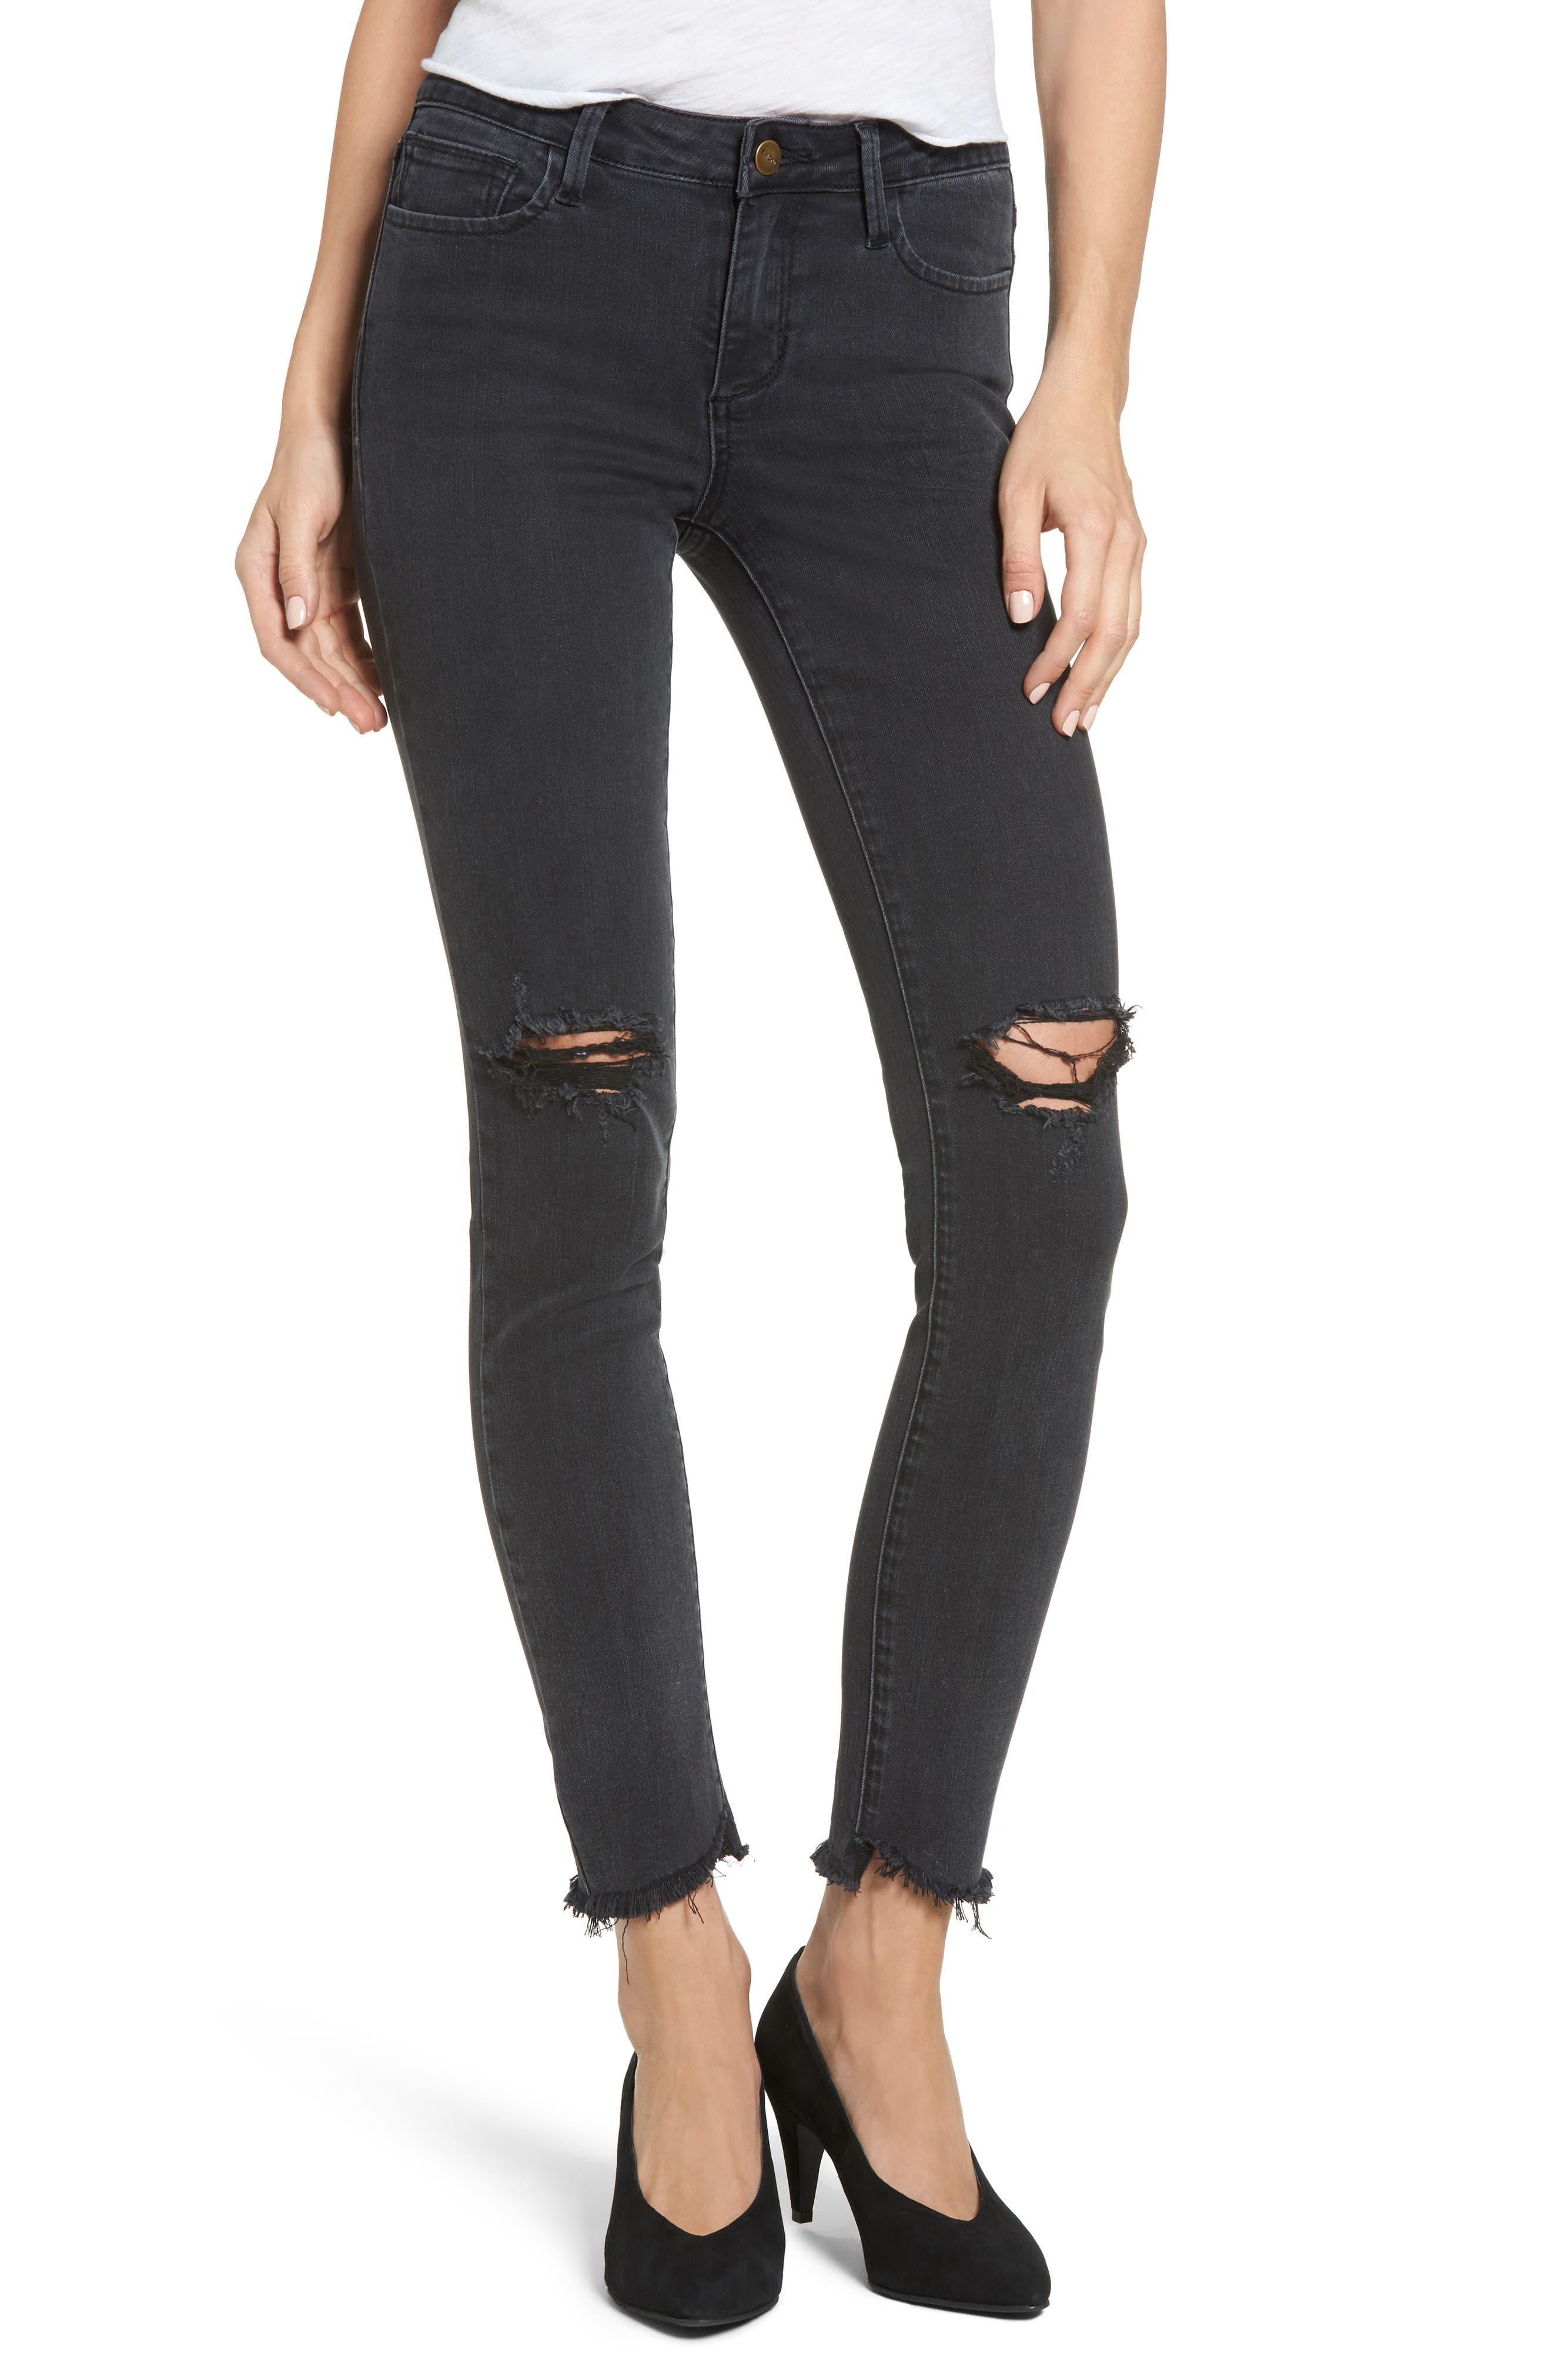 Main Image - EVIDNT Tate Distressed Skinny Jeans (Blacktop)